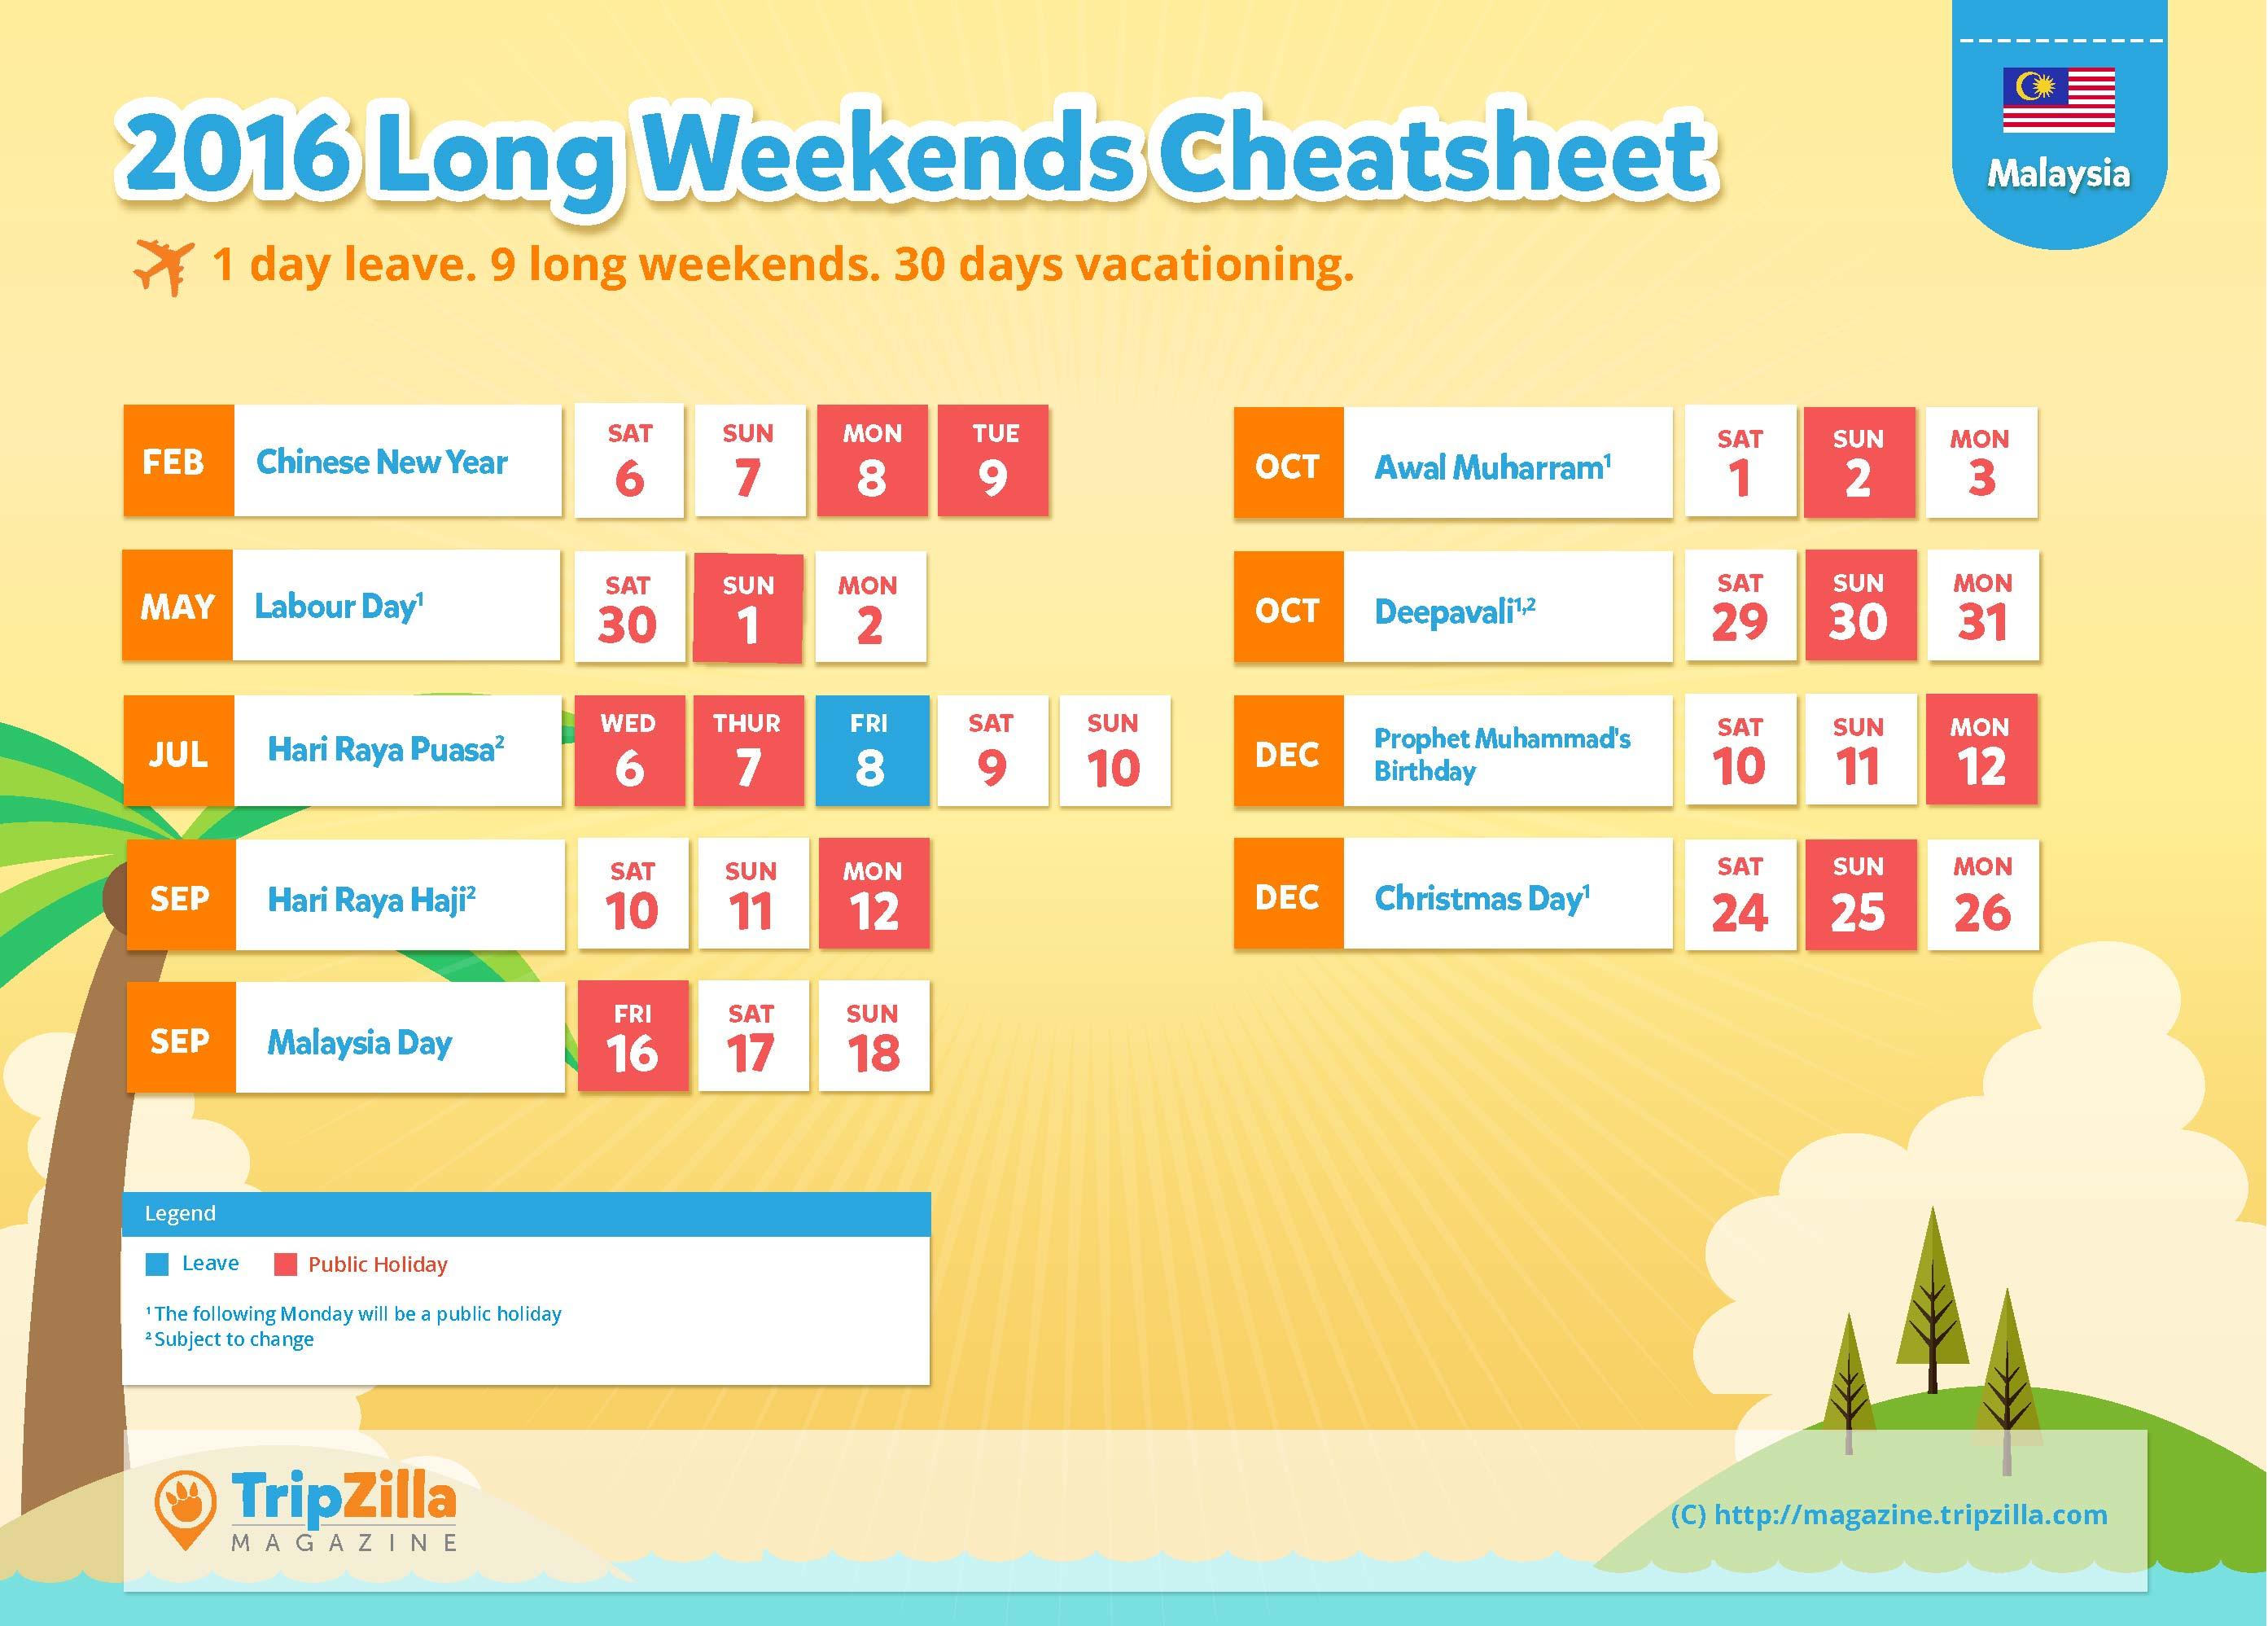 ... Magazine - Malaysia 2016 Long Weekends and Public Holidays Cheatsheet